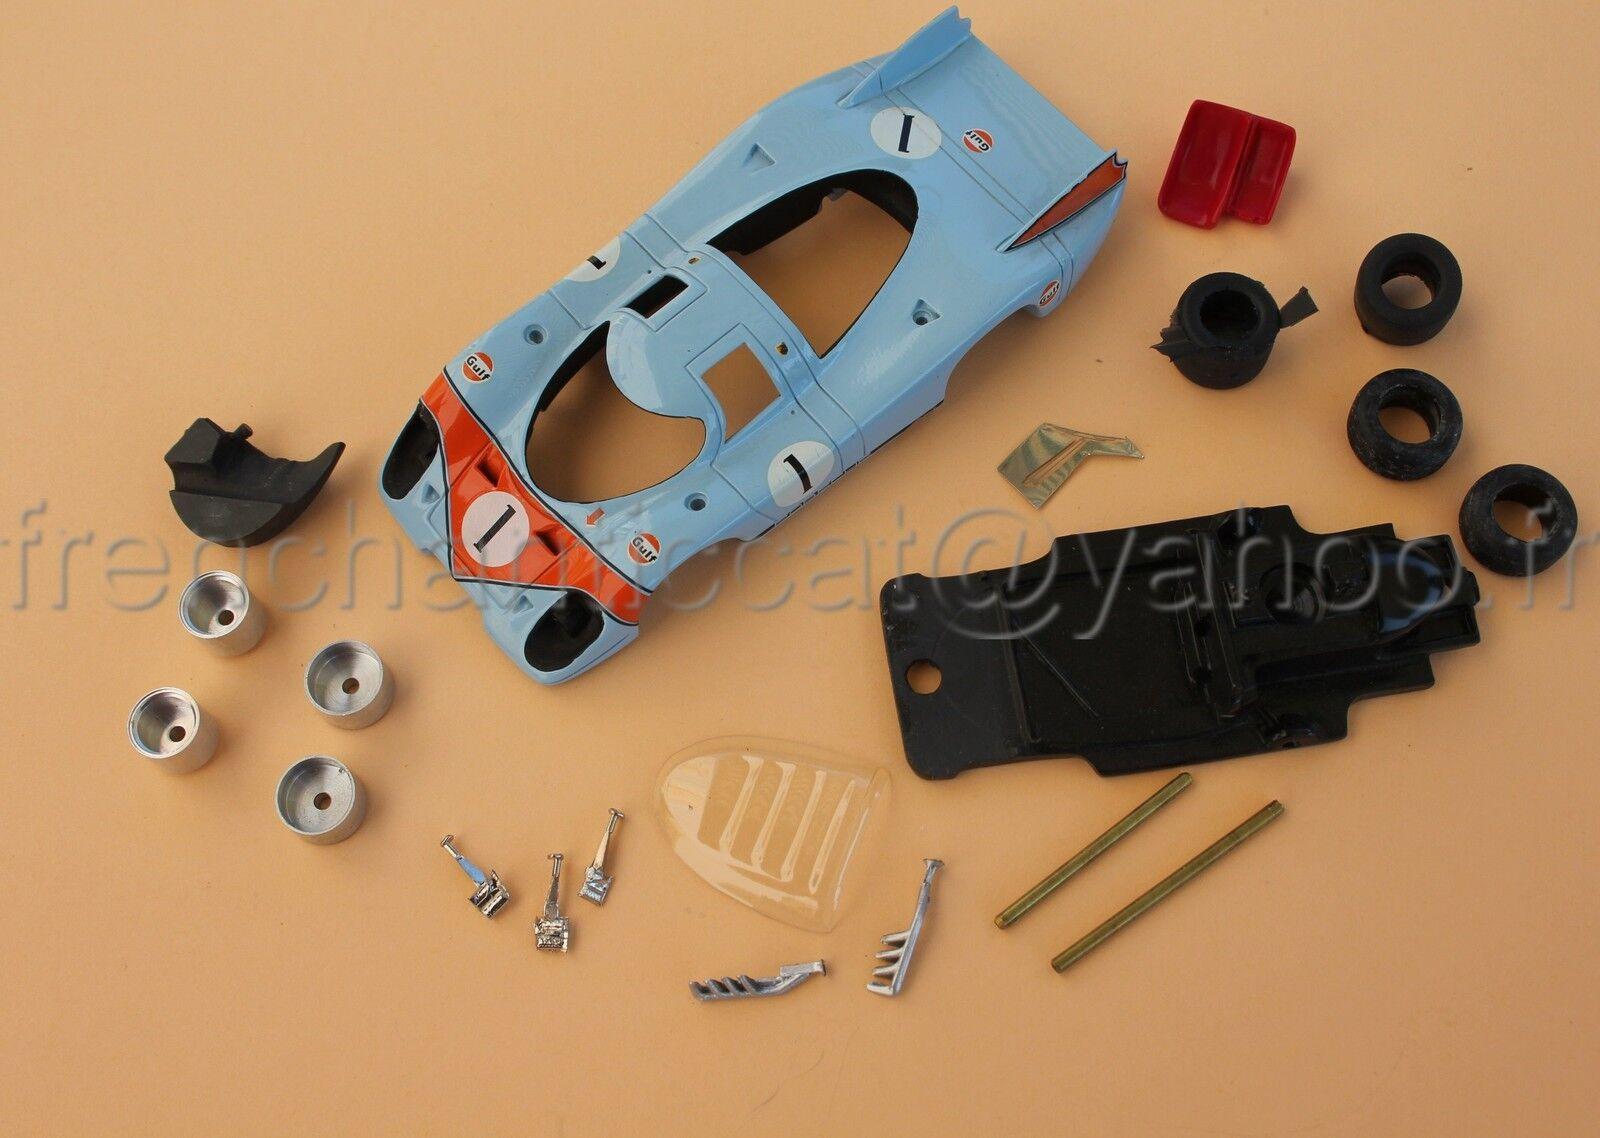 Cs Rara Predotipo Prova Heco Porsche 917 1 43 Miniatura N.11 le Mans Gulf blue